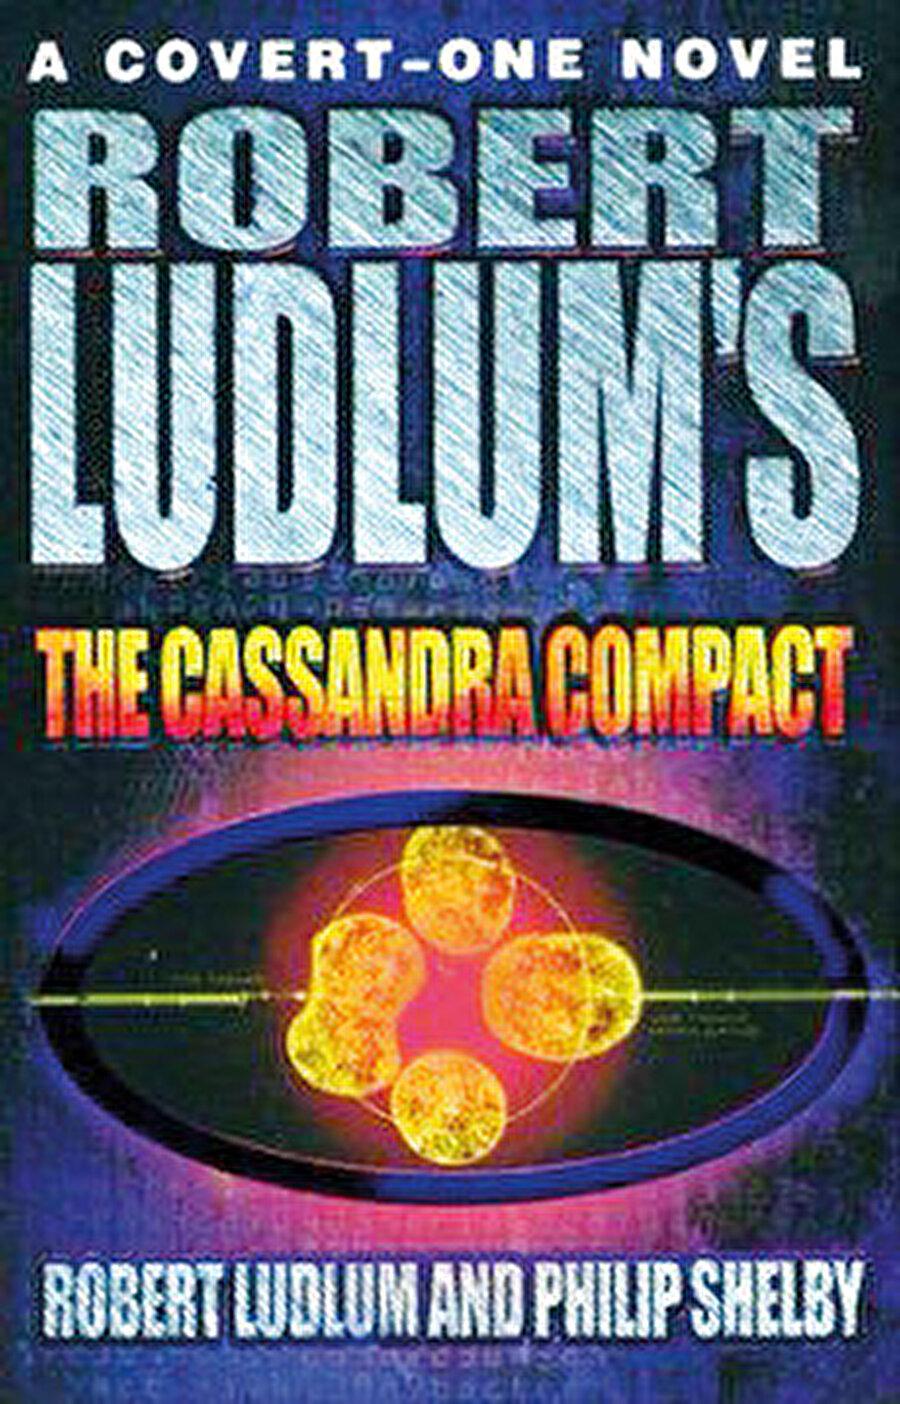 Robert Ludlum'ın Cassandra Compact romanı.